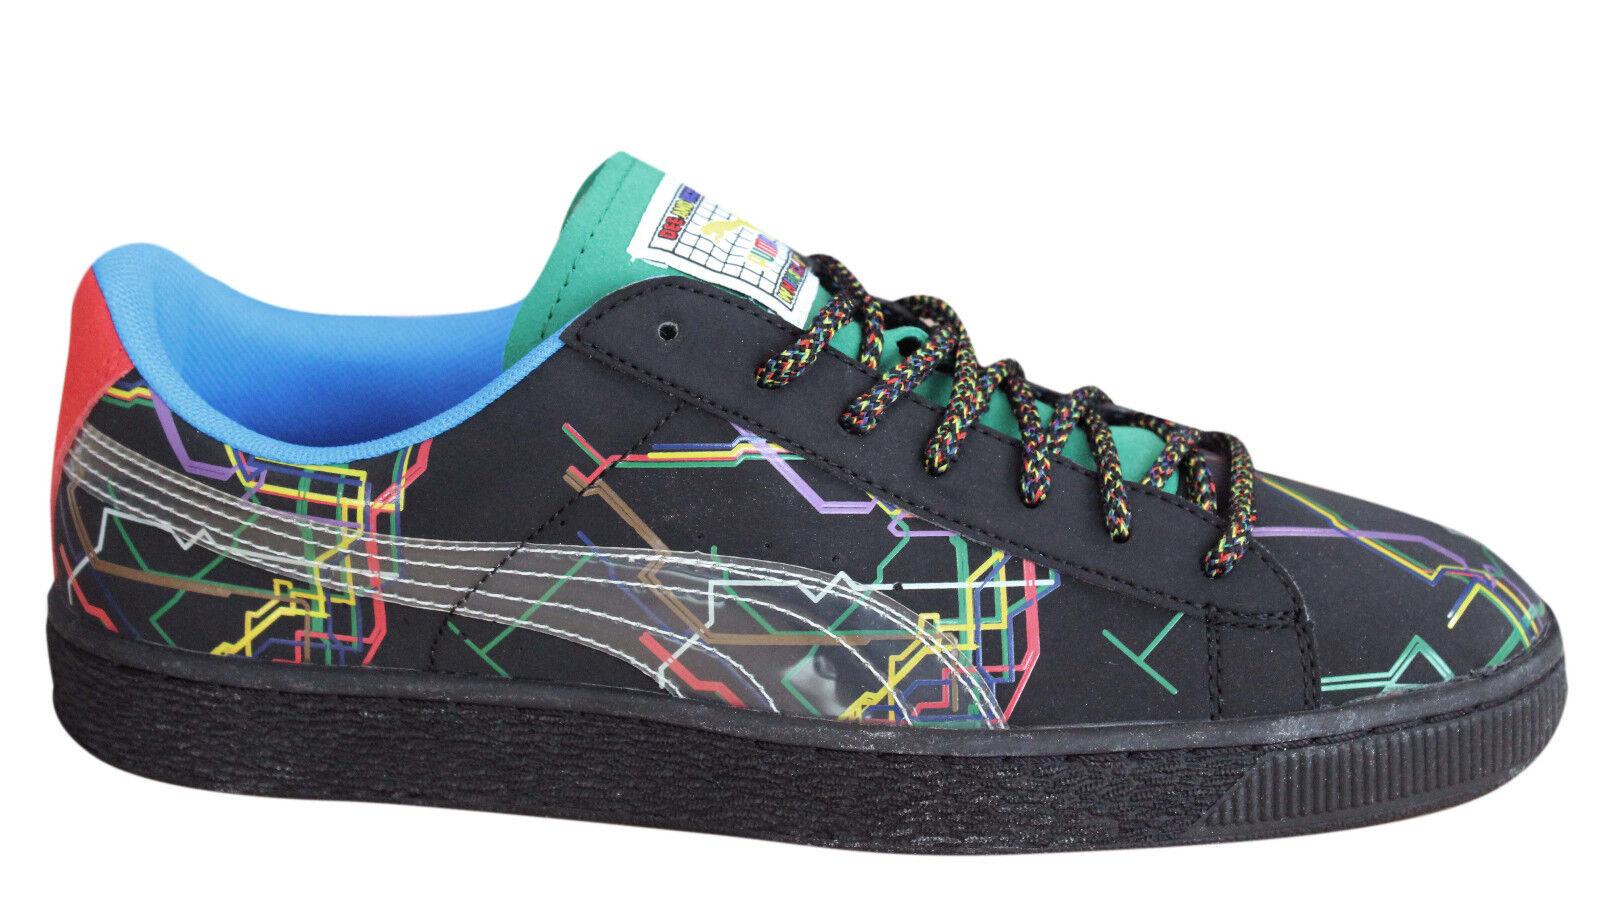 best website 47647 5f428 Details about Puma Basket x Dee & Ricky Mens Trainers Lace Up Shoes Black  361498 01 B44D